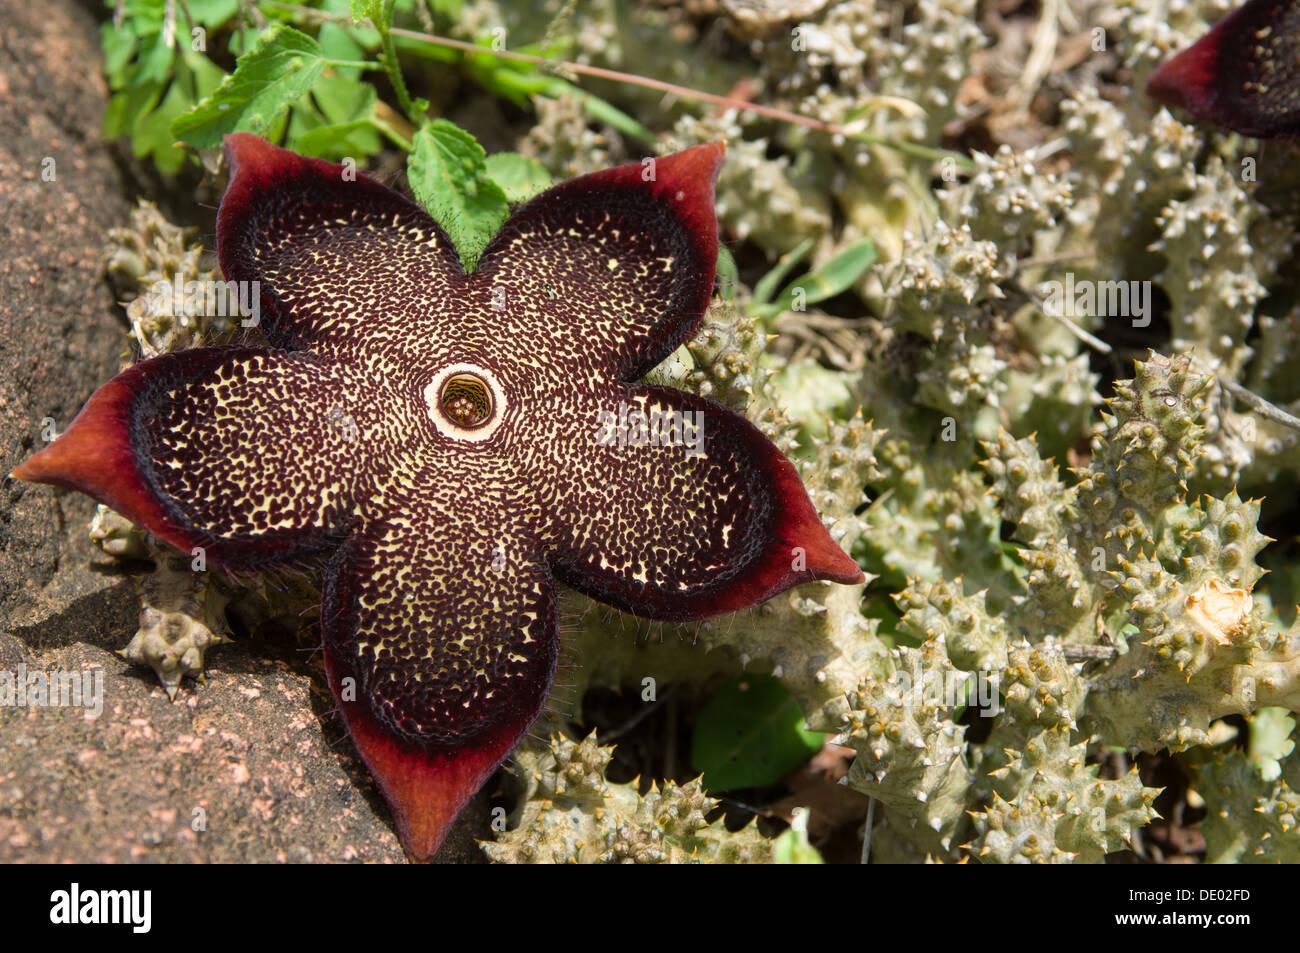 Succulent plant, Fermhin, Socotra, Yemen - Stock Image